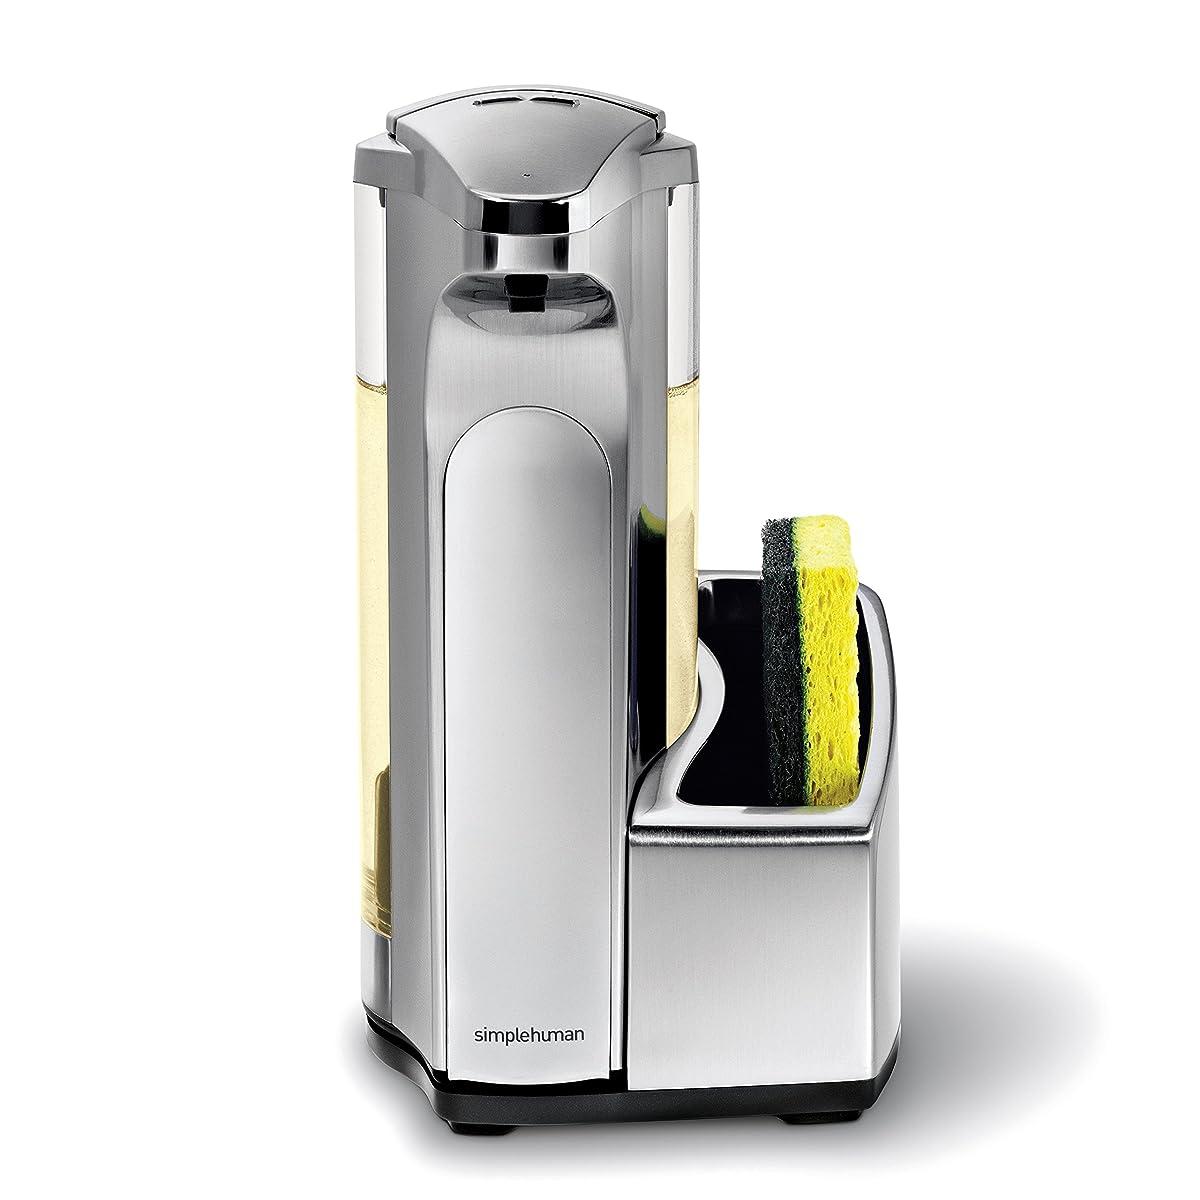 simplehuman 13 oz. Sensor Pump with Caddy, Brushed Nickel